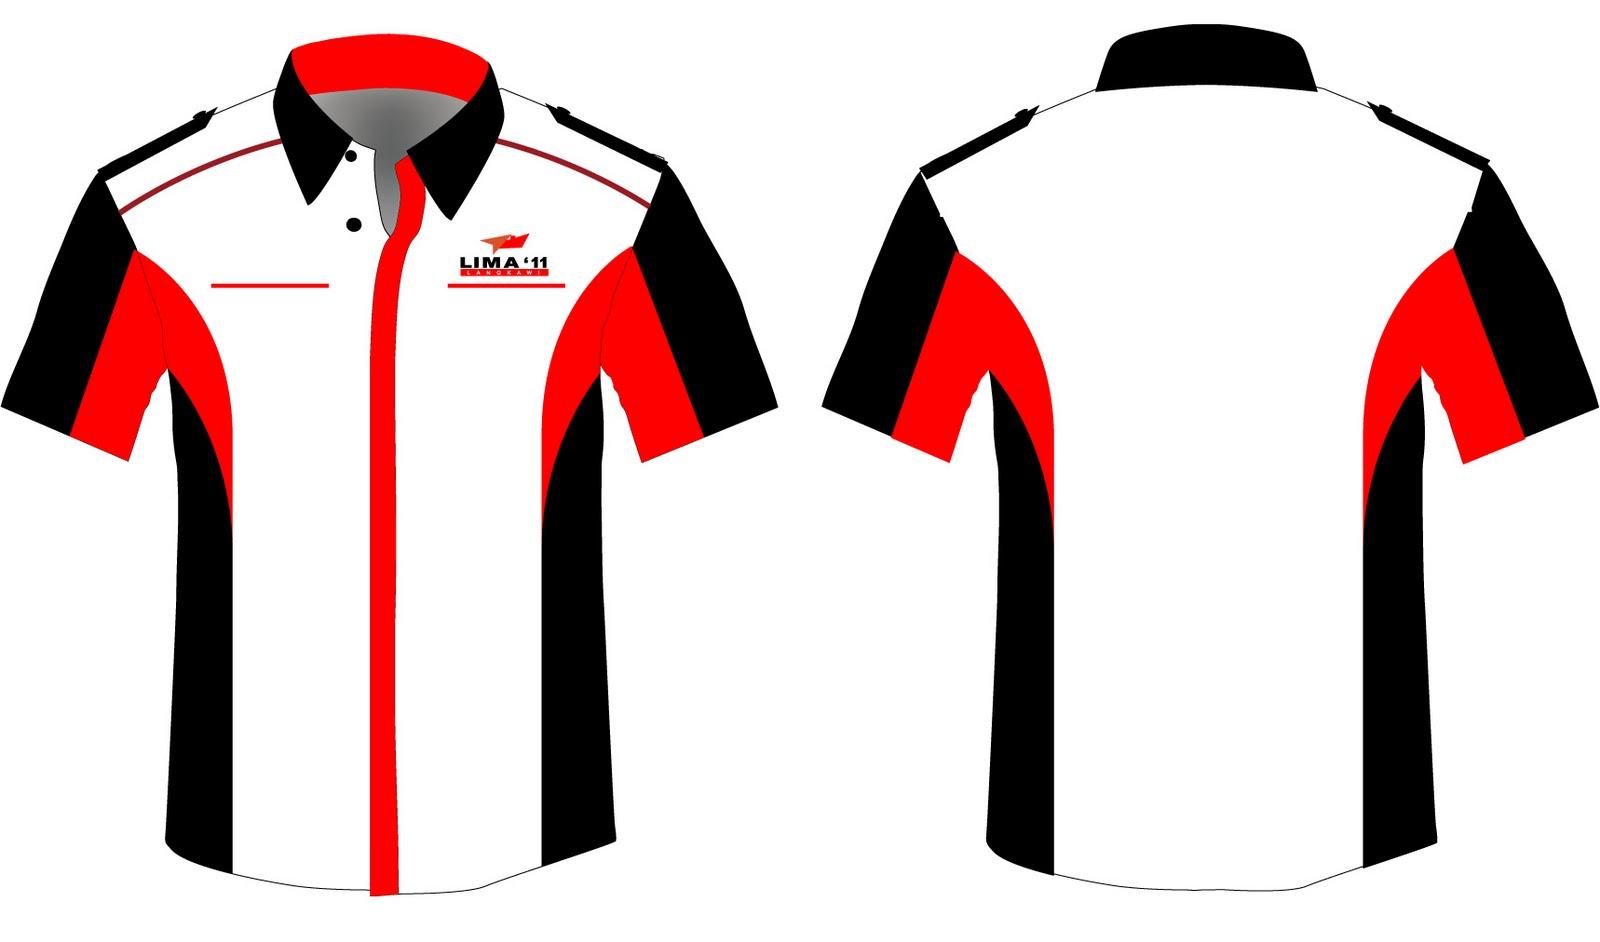 Corporate Shirts 2011 | Corporate Shirts